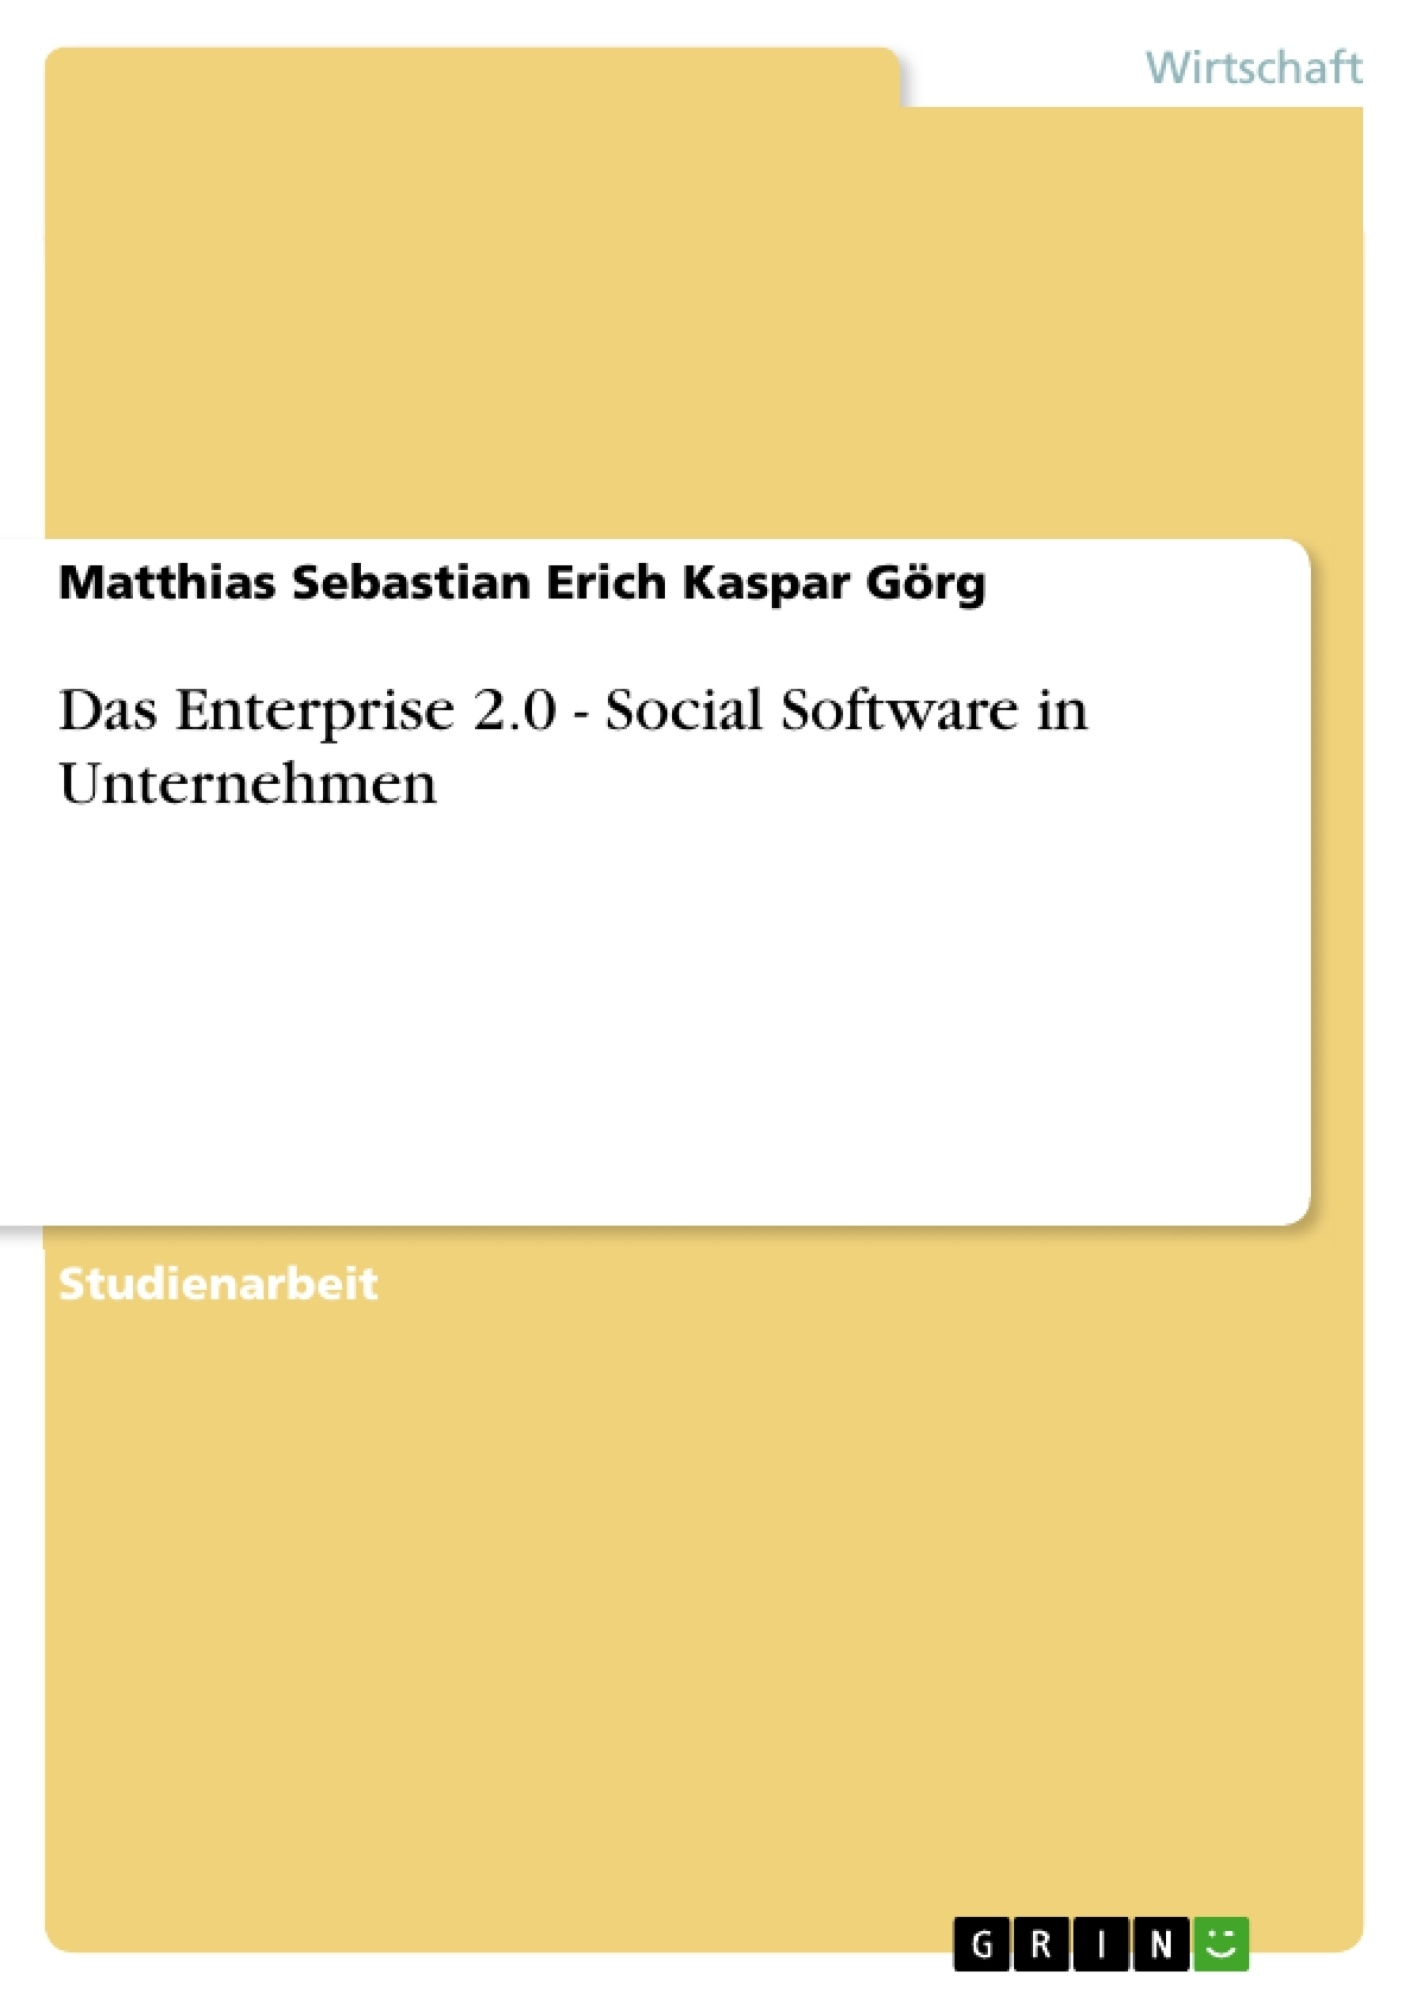 Titel: Das Enterprise 2.0 - Social Software in Unternehmen